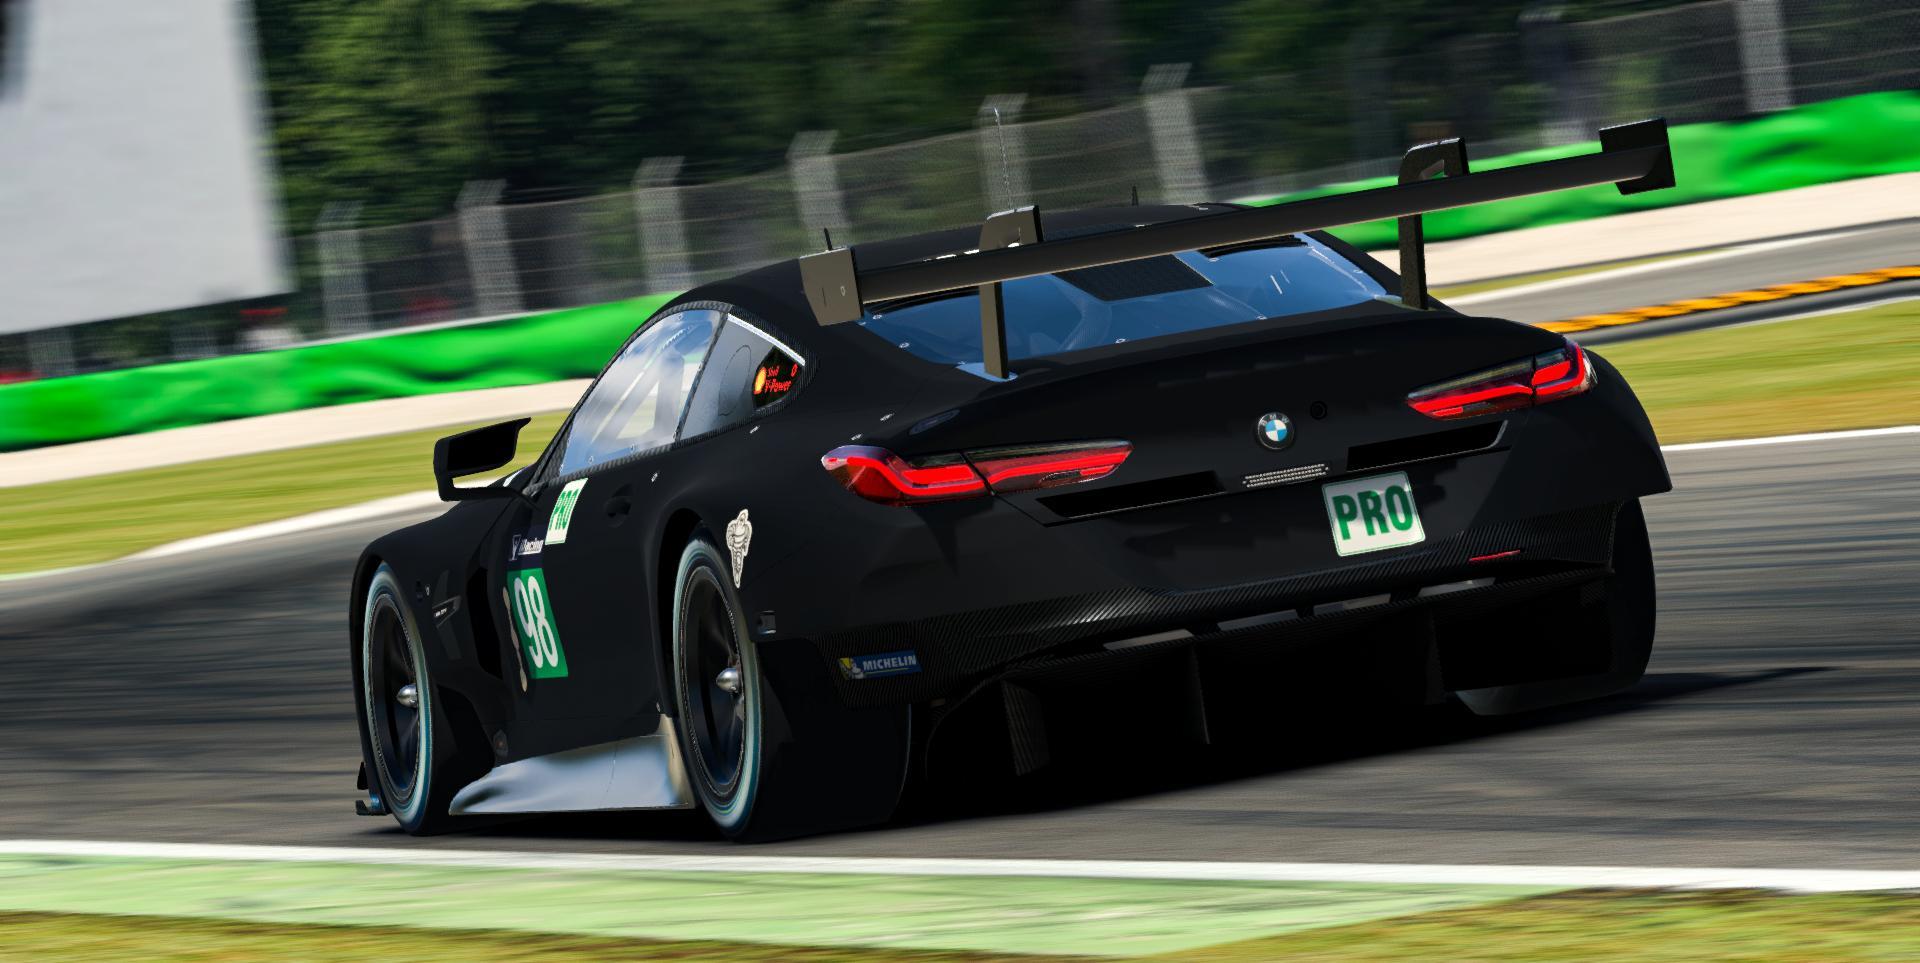 Preview of BMW M8 GTE - Stealth Black Matte by Dani Elgarbay